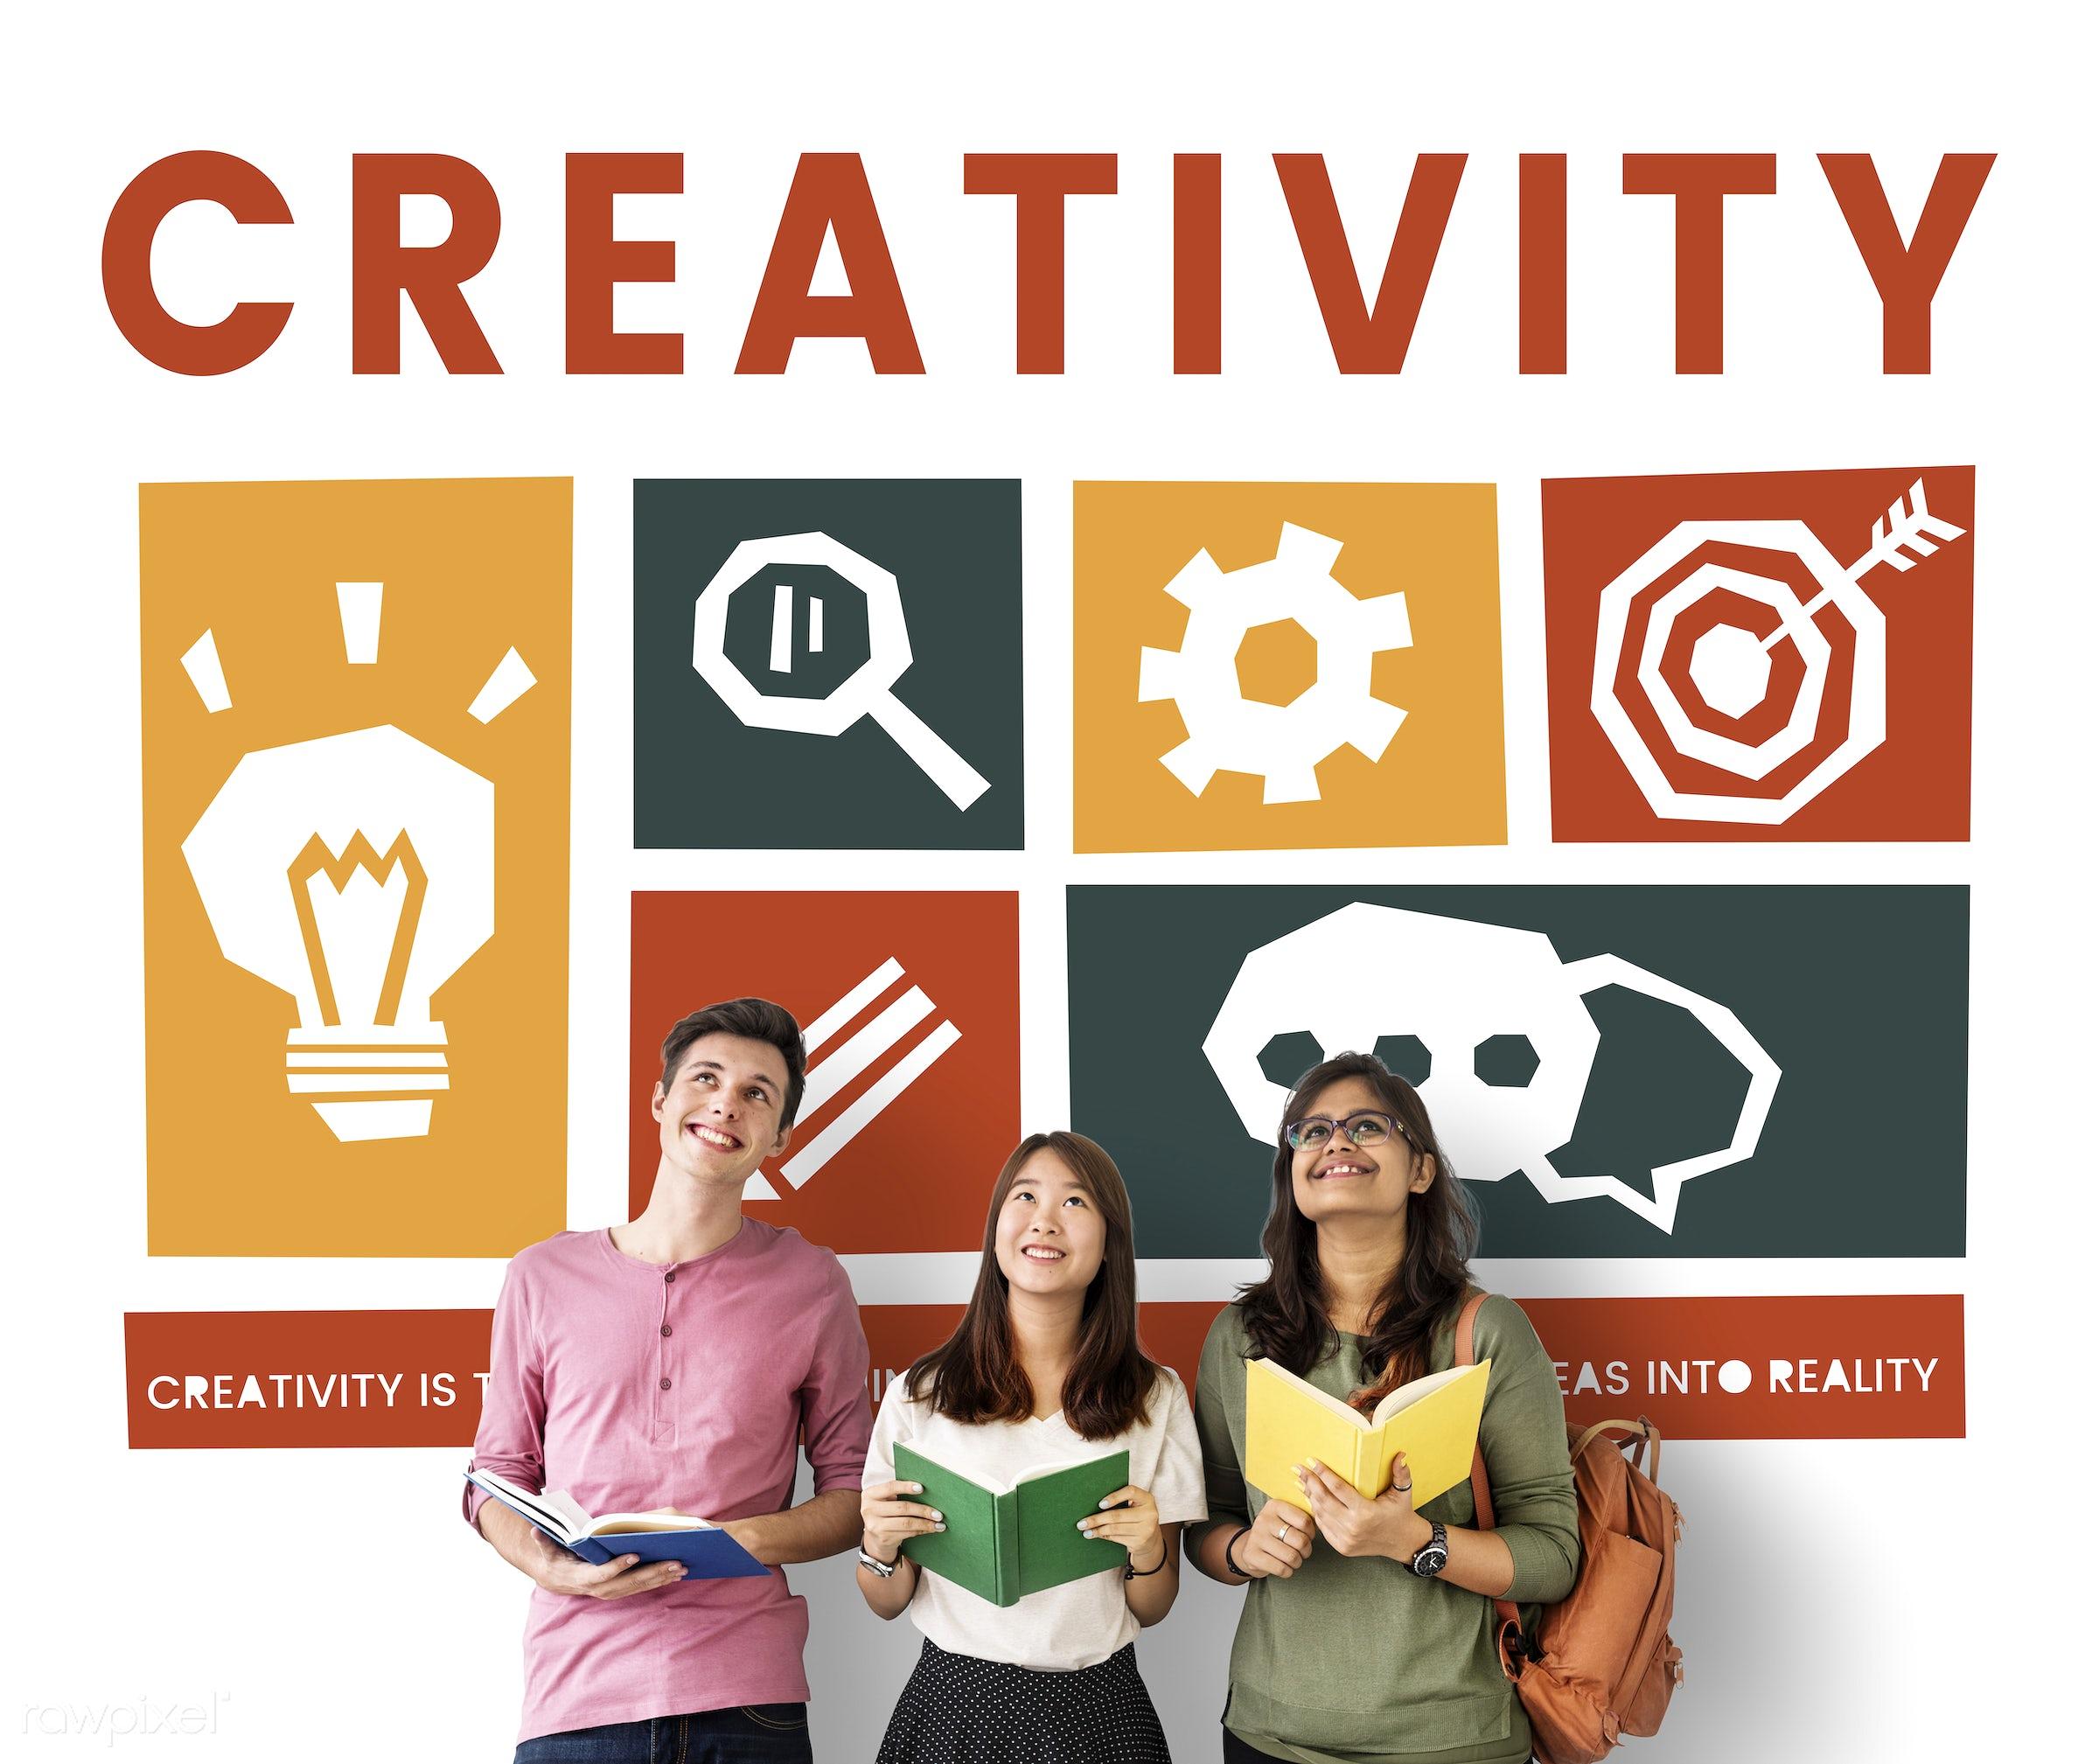 african descent, asian, book, caucasian, chat, cog, creative, creativity, design, diversity, enjoyment, fresh, friends,...